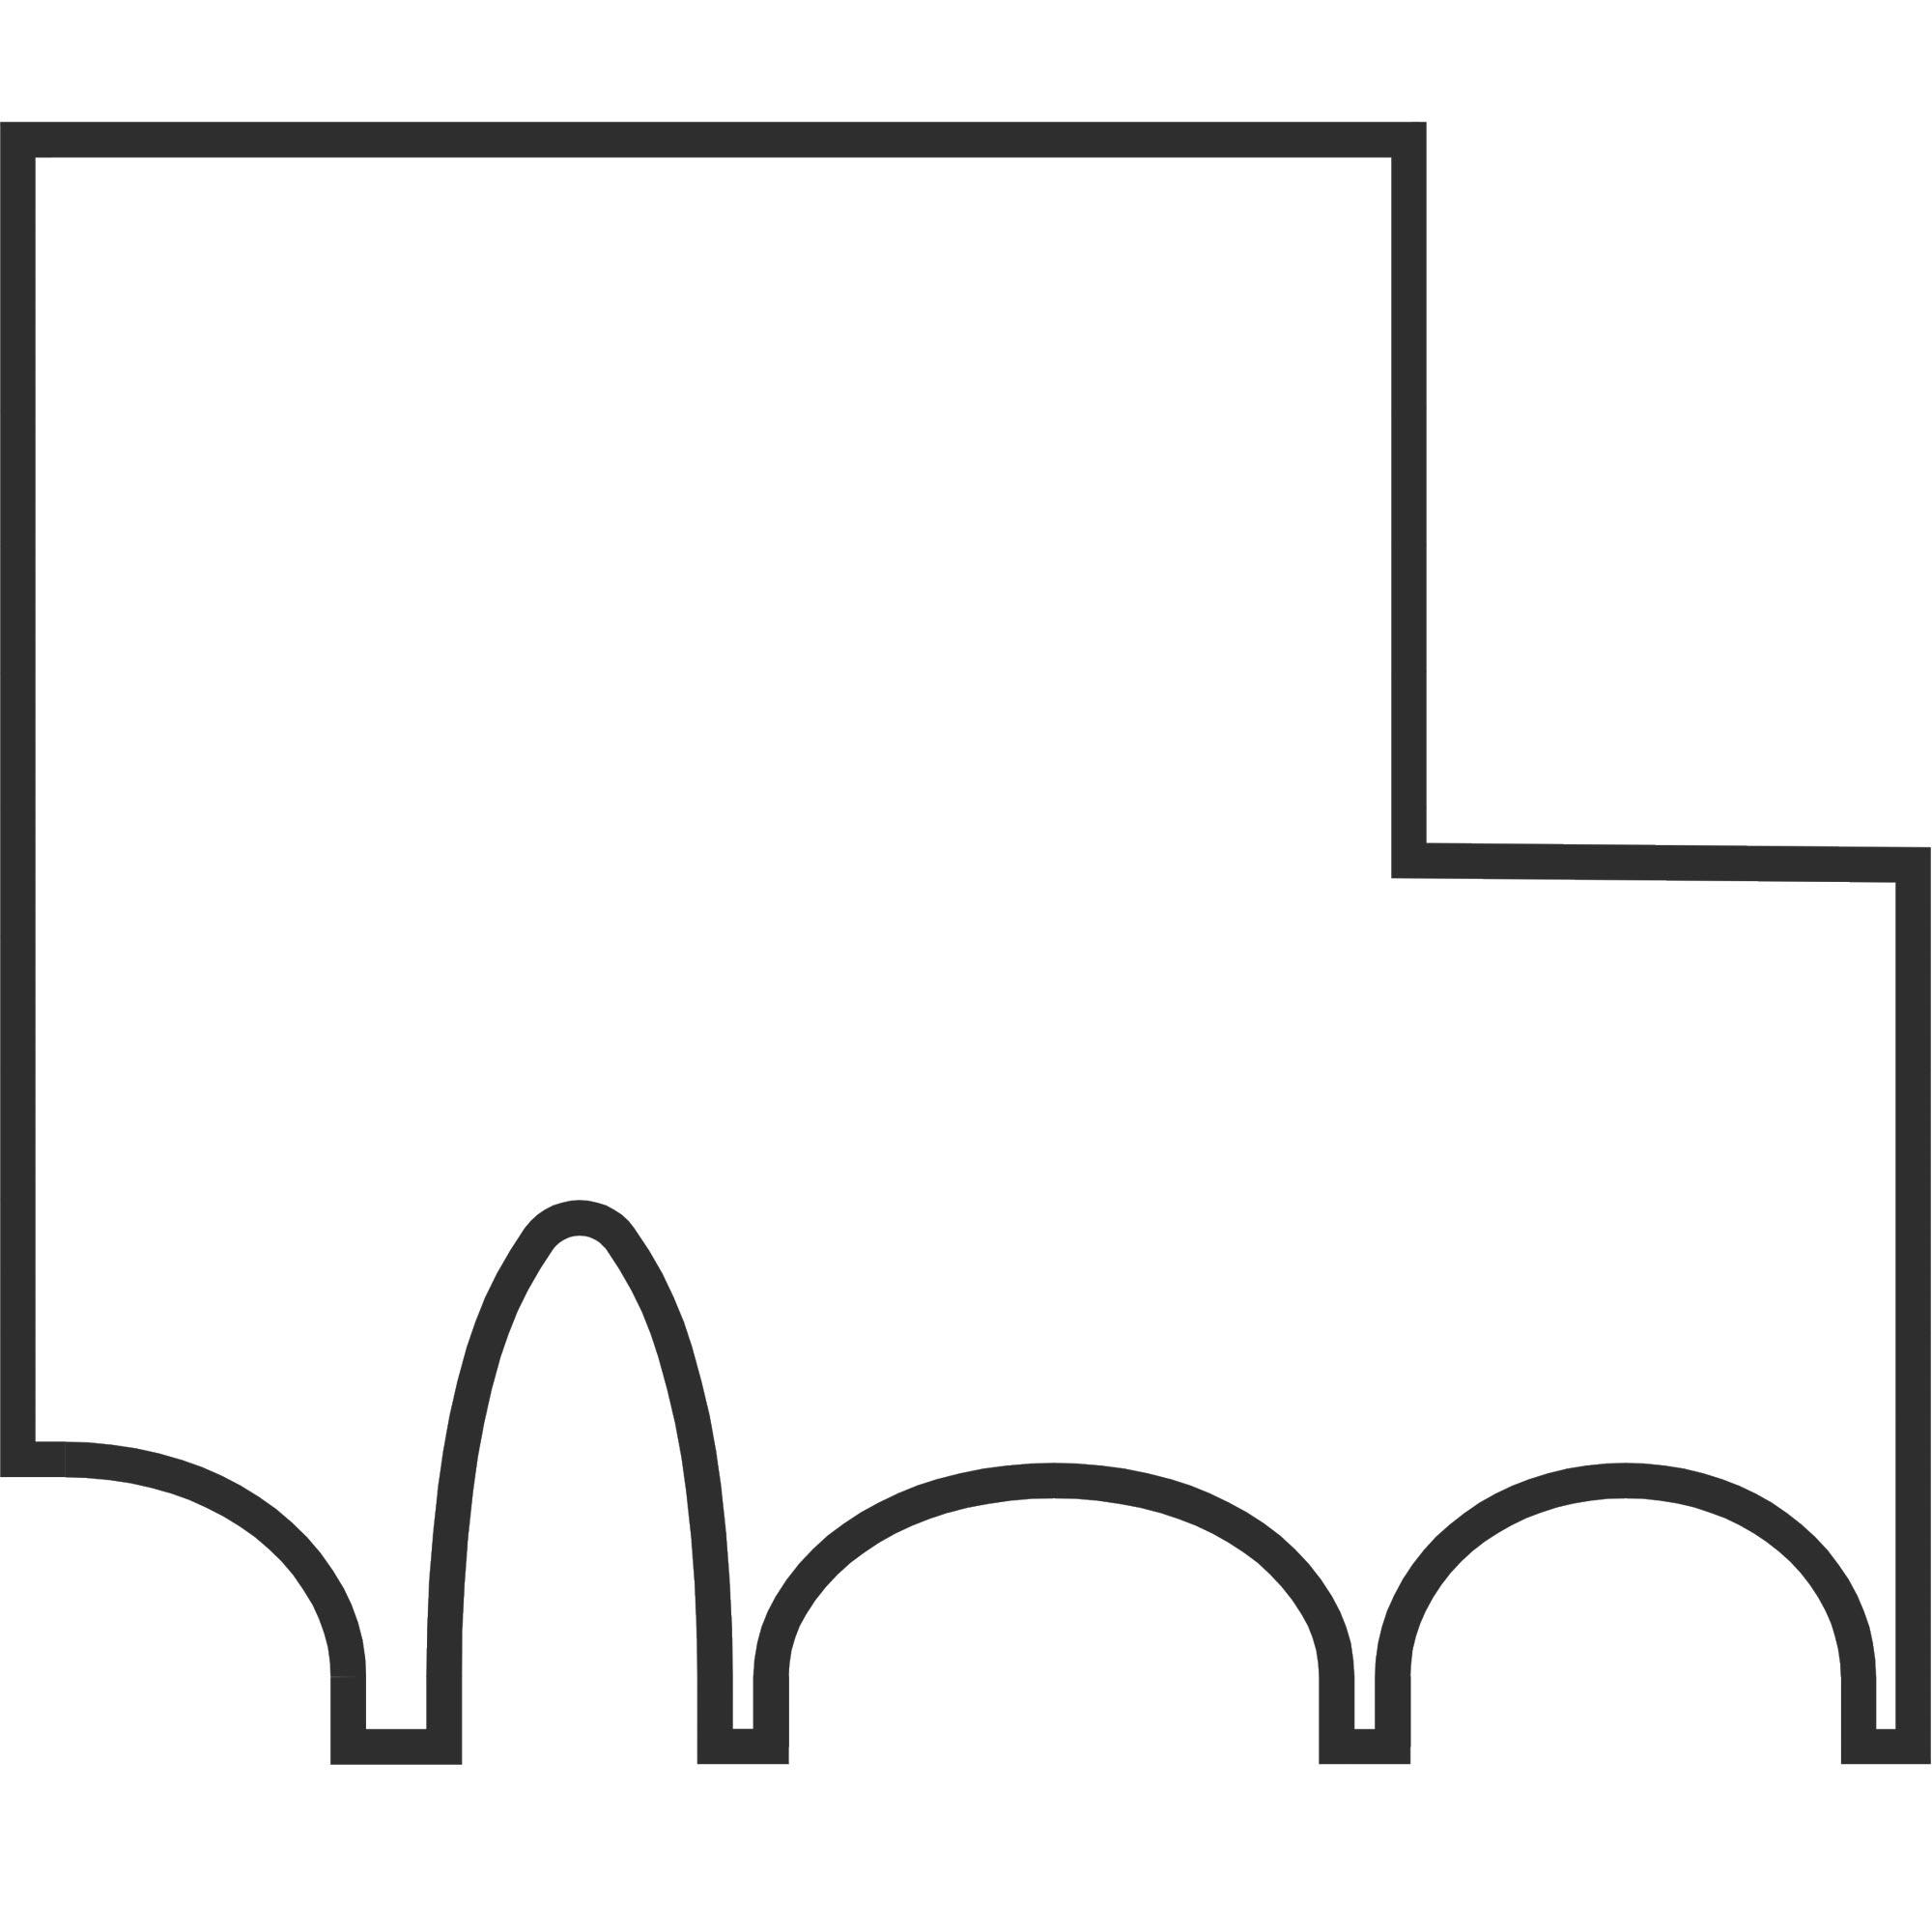 Institute building of Pharmacy, logo. Berger+Parkkinen Architekten